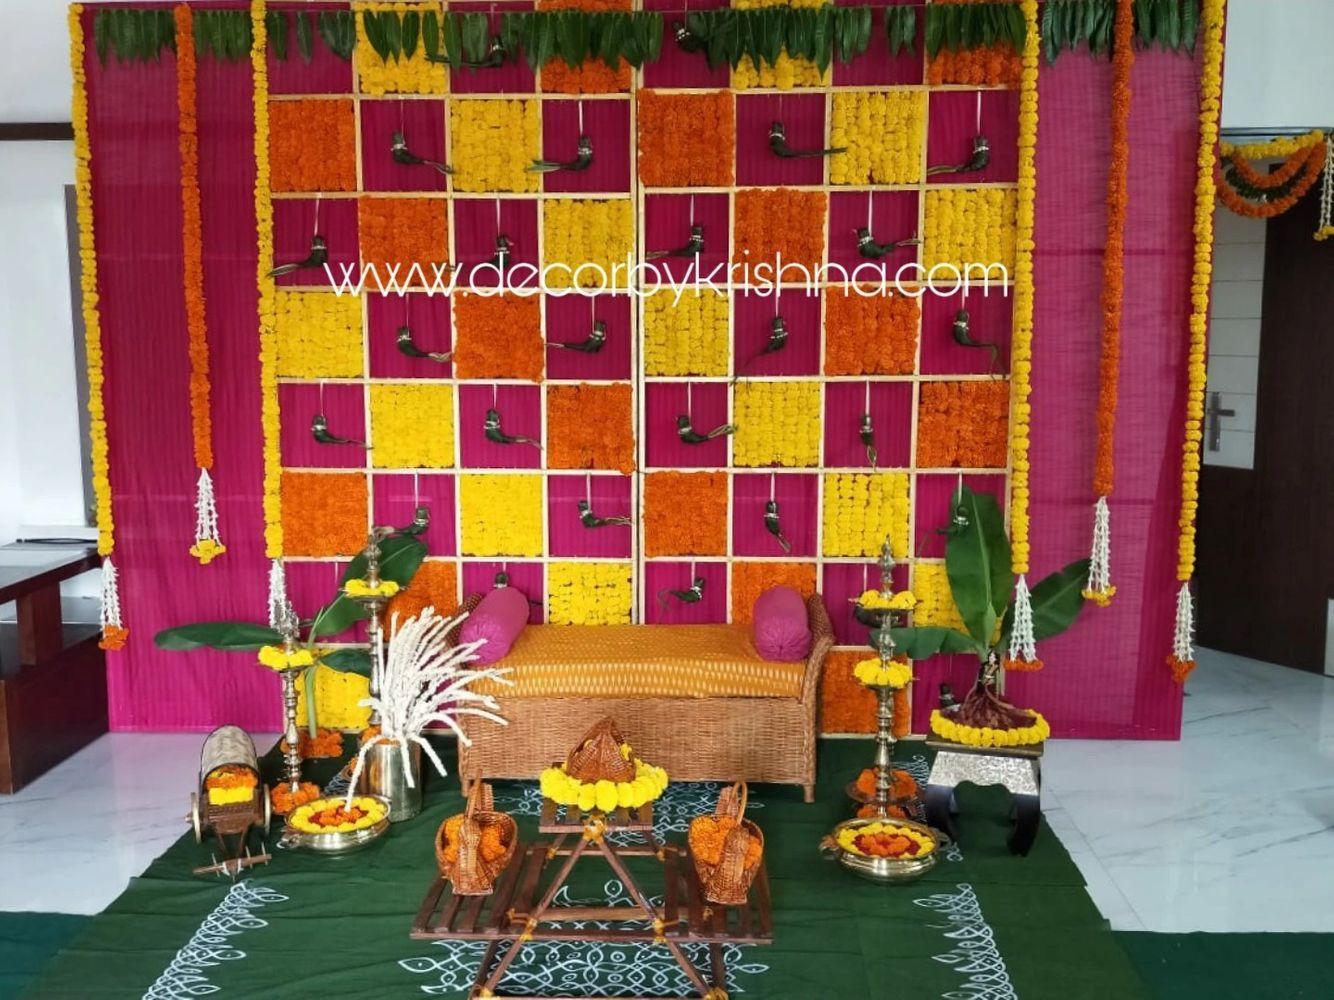 DecorbyKrishna Wedding Decoration, Florist (With images